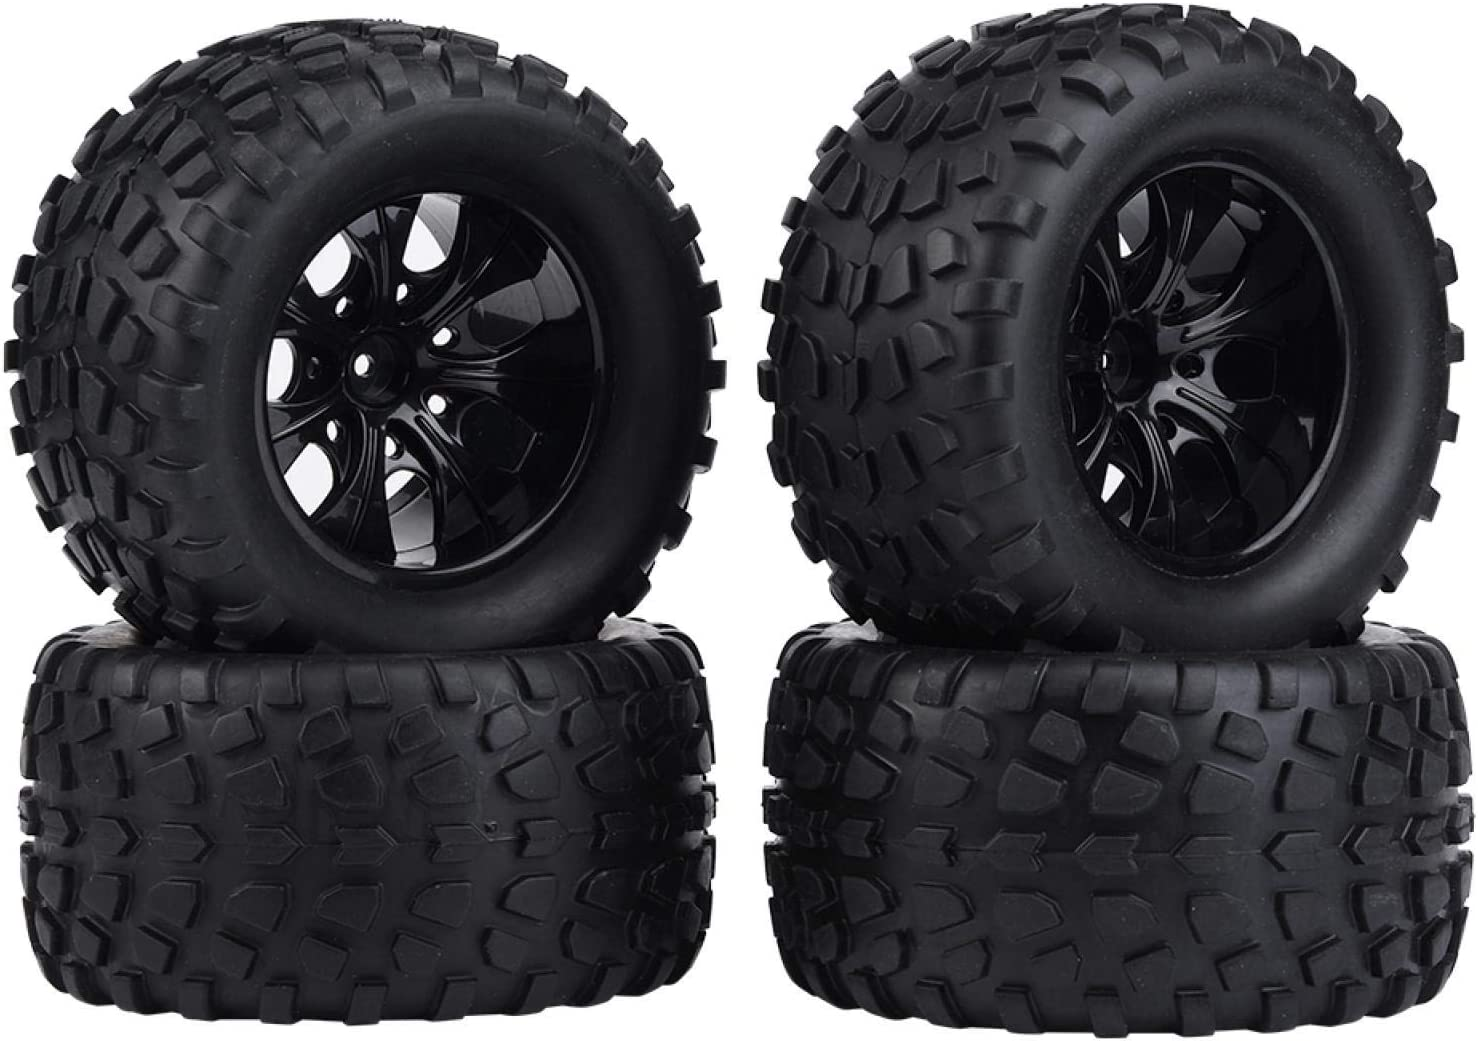 EVTSCAN RC Wheel andTire 4pc Tire Rubber Under blast sales Set 1:10 Max 47% OFF